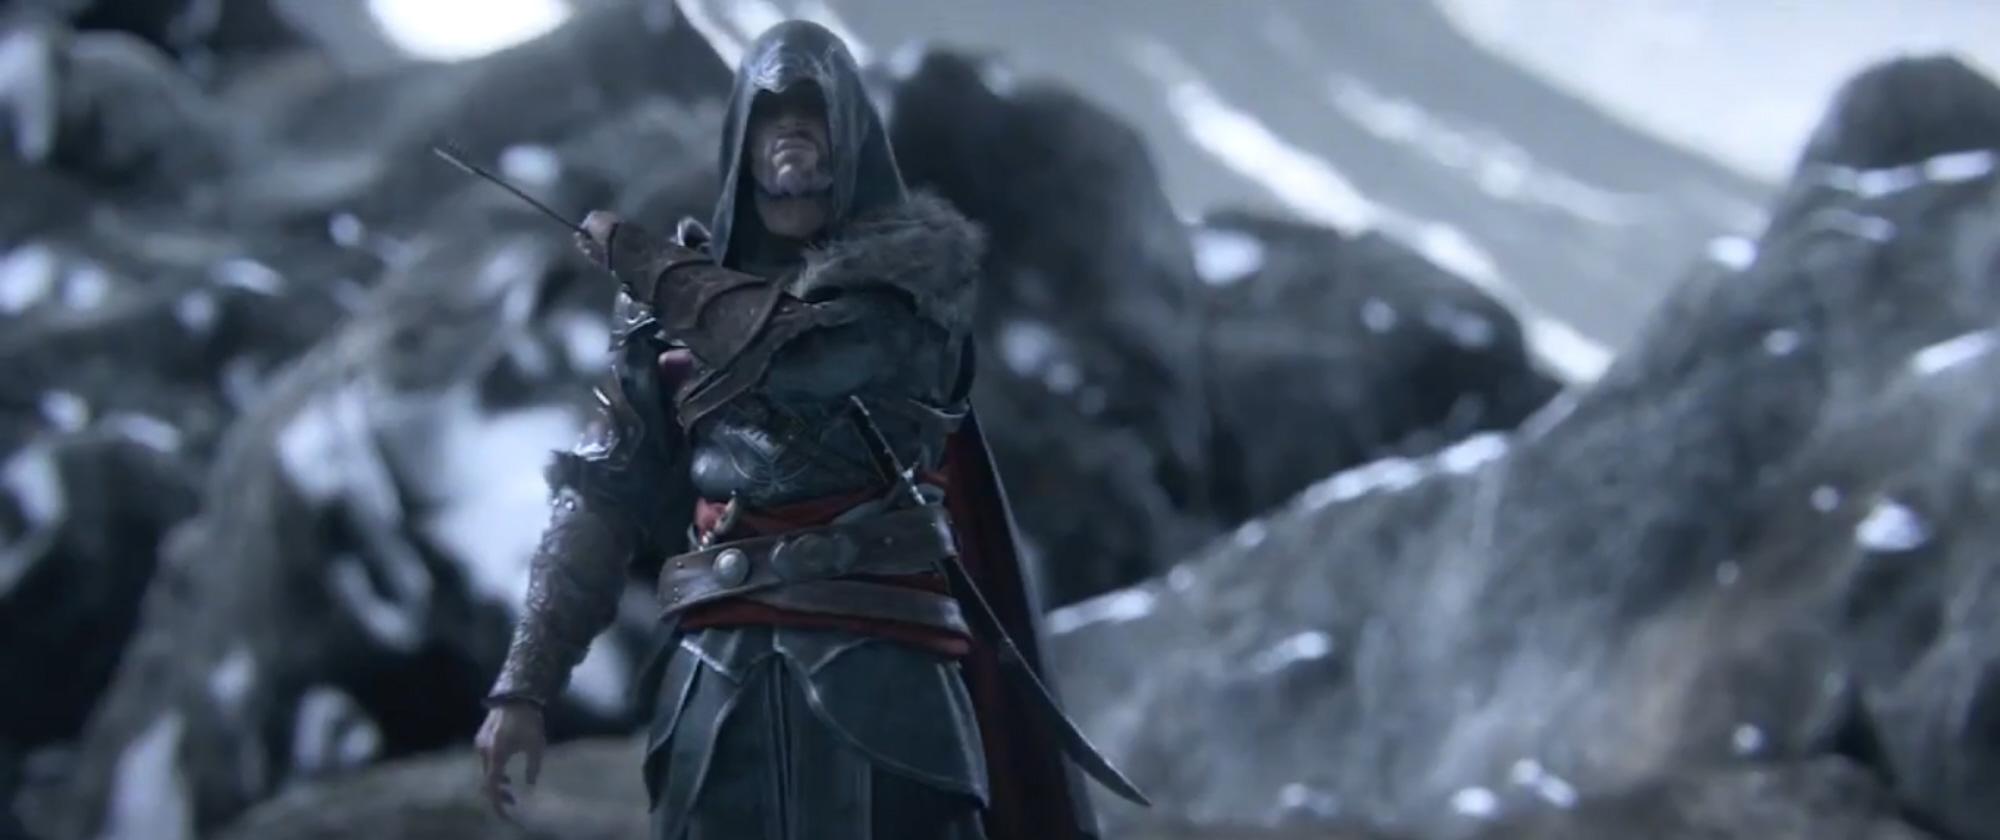 Assassins Creed Revelations wallpaper 85764 2000x840